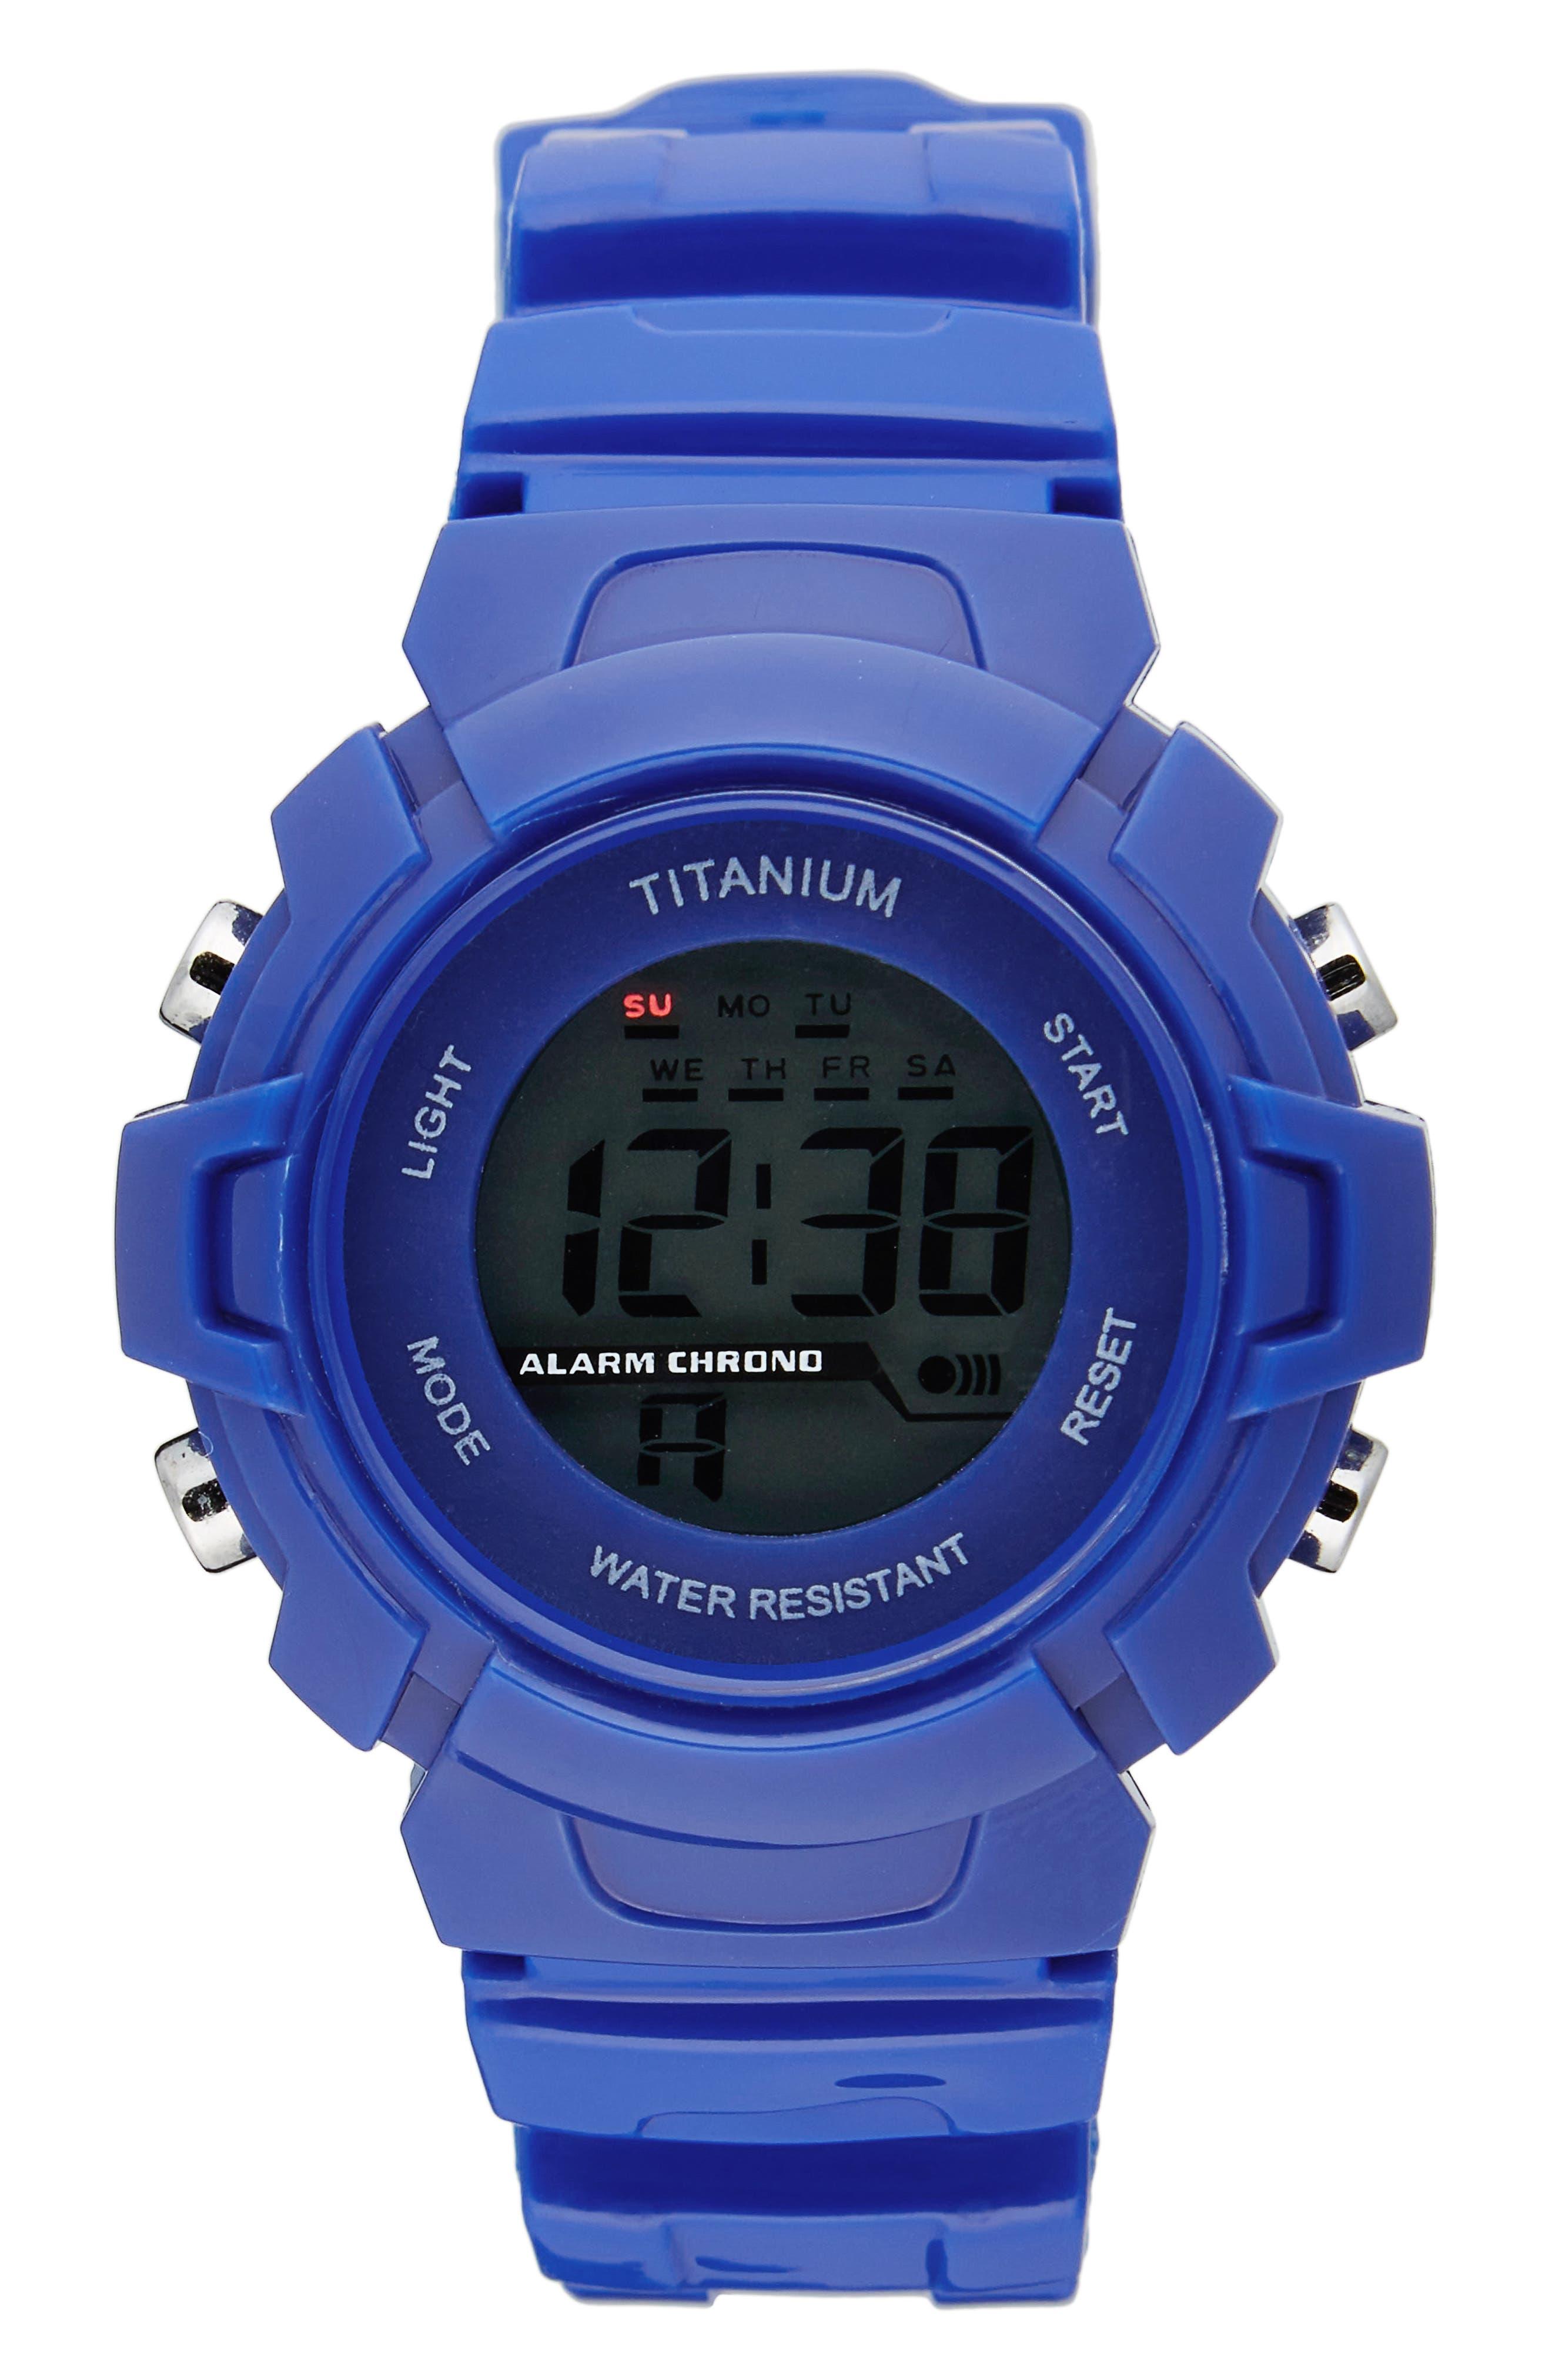 TITANIUM LCD Sport Watch